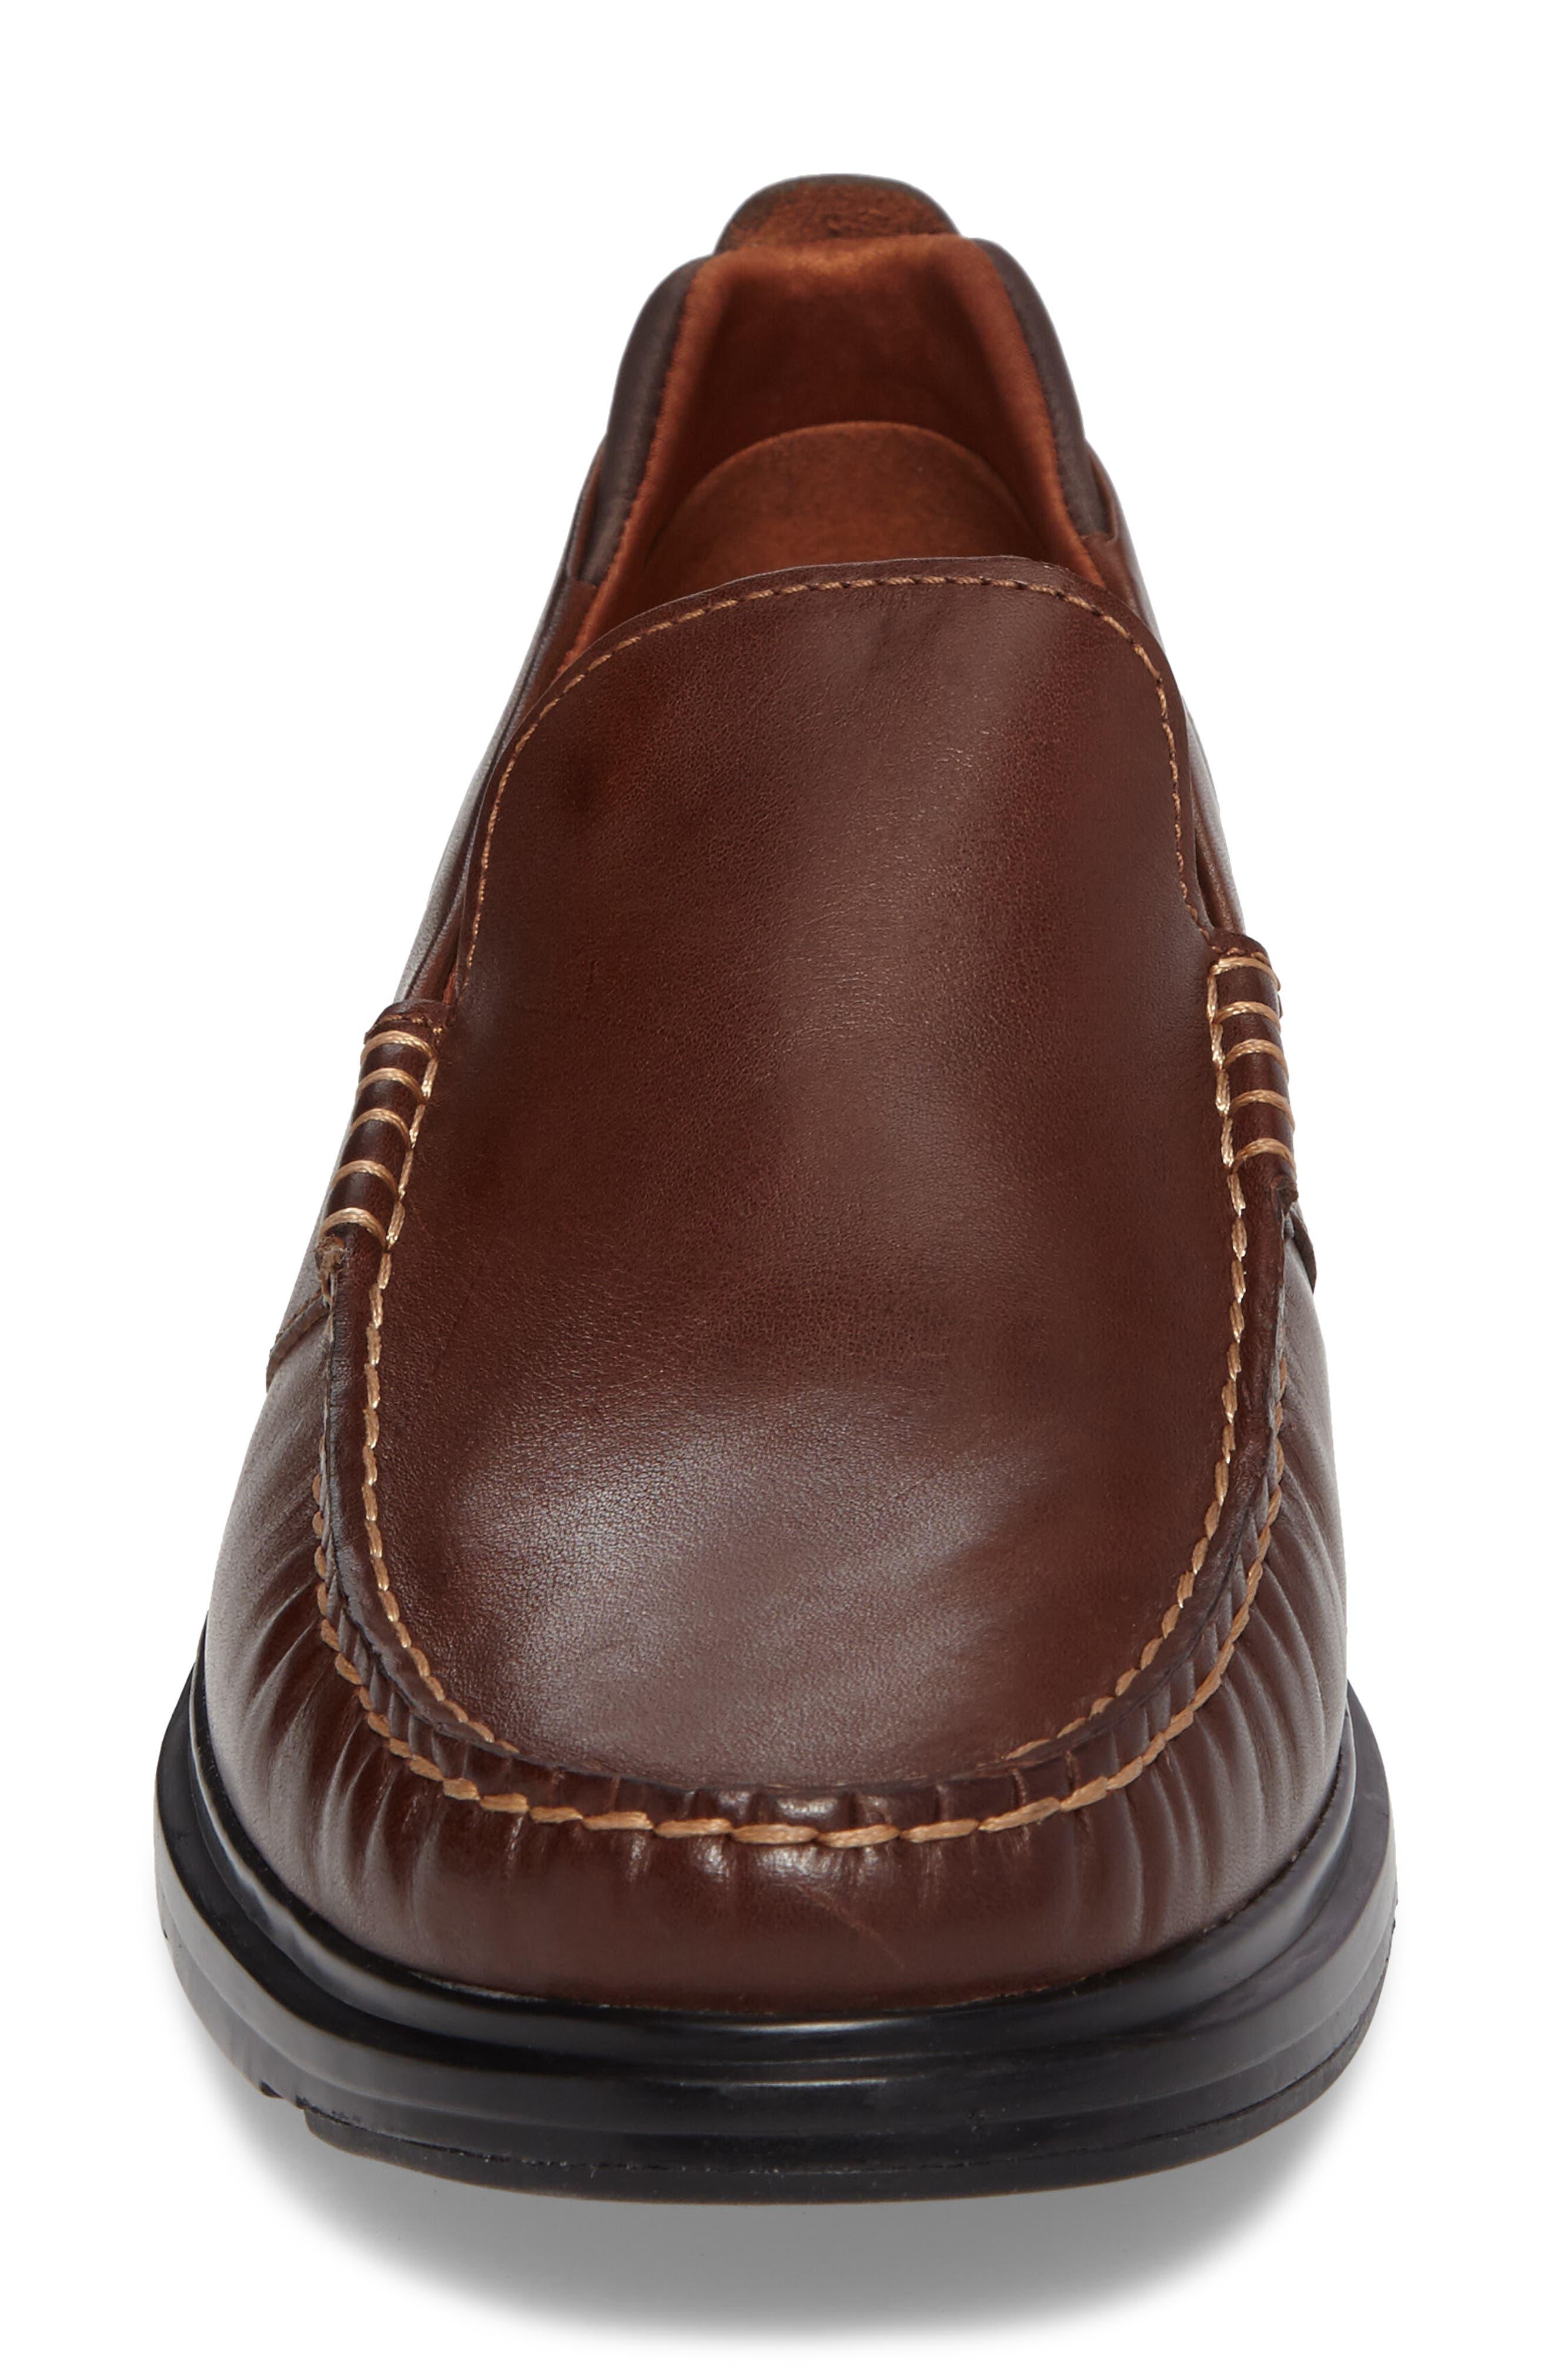 Bancroft Loafer,                             Alternate thumbnail 4, color,                             Harvest Brown Leather